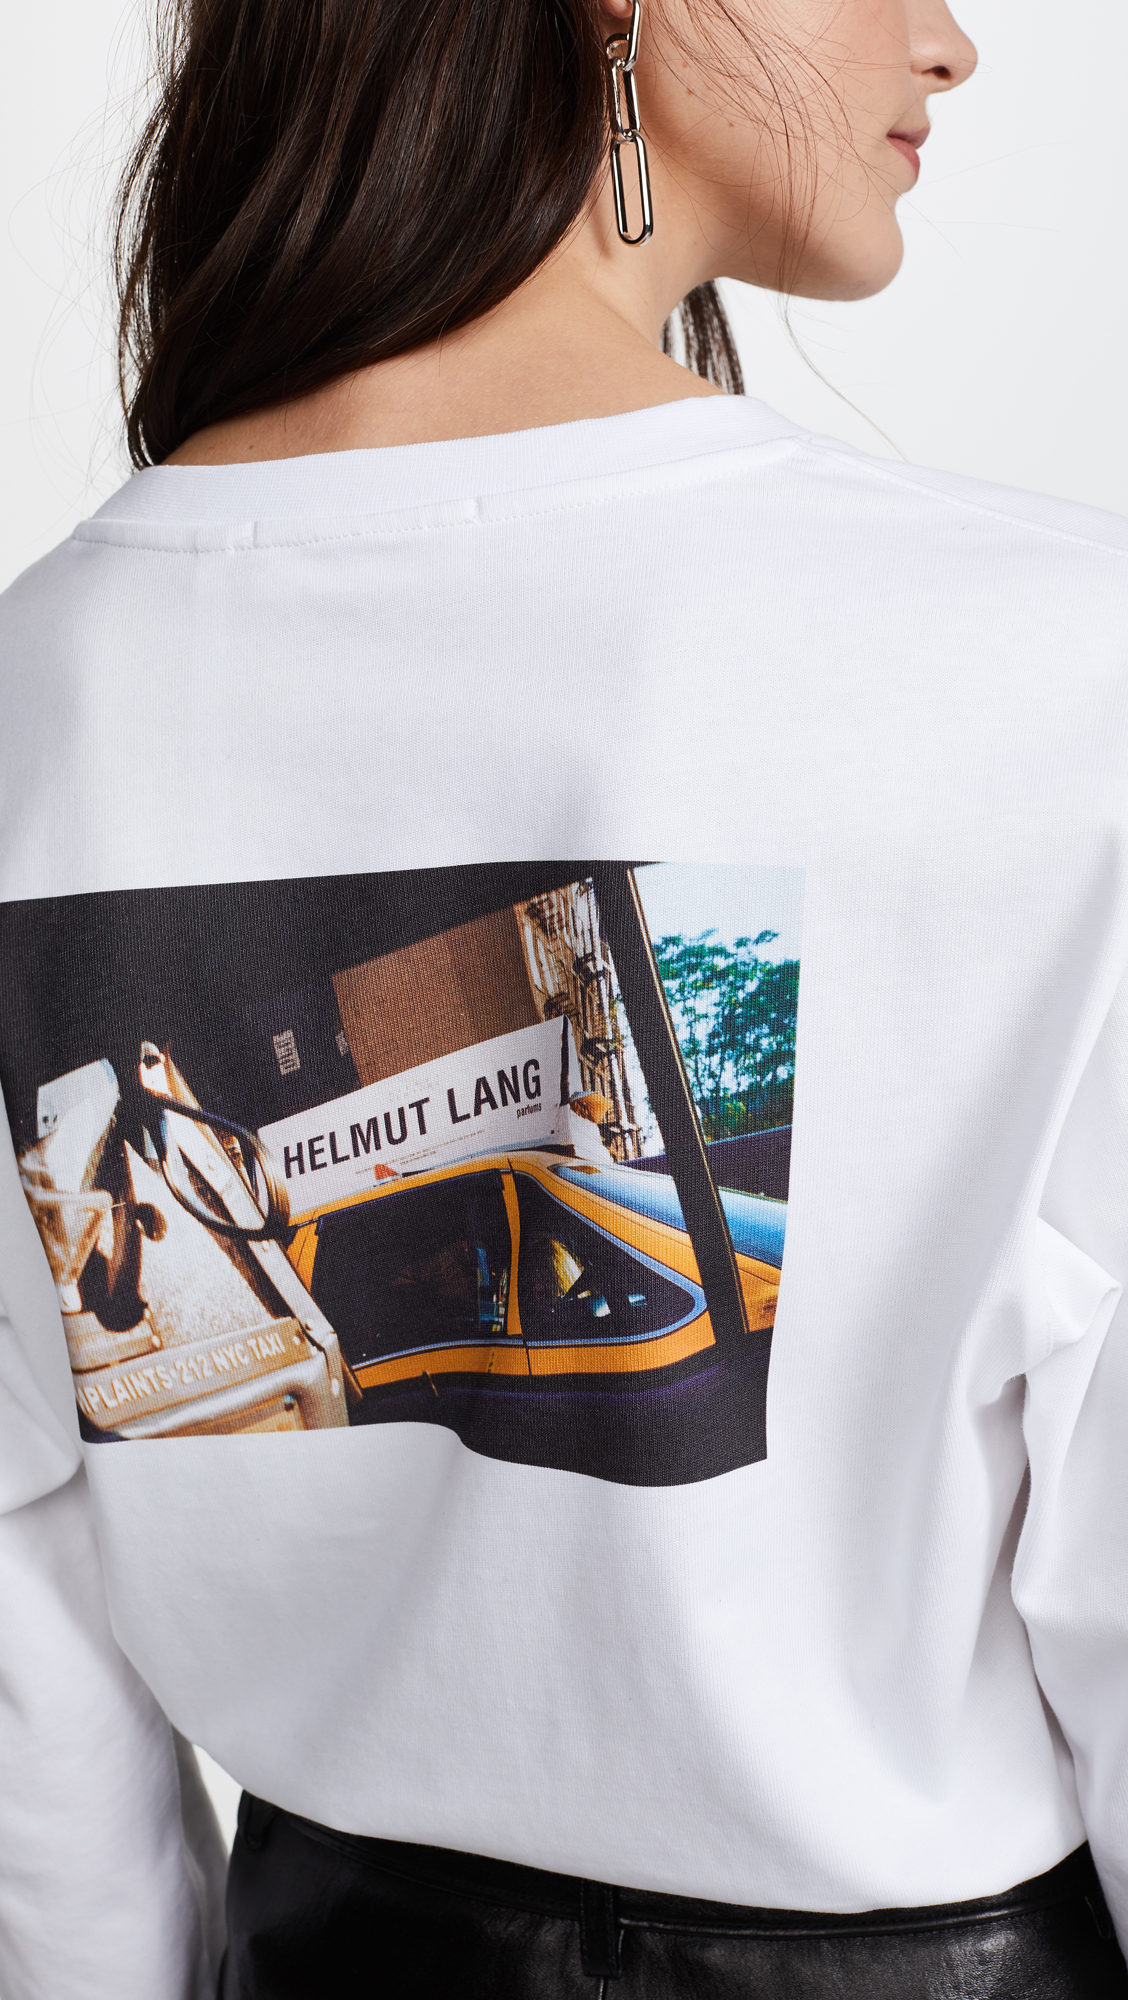 753cd06b012ea6 Helmut Lang Long Sleeve Taxi T-Shirt